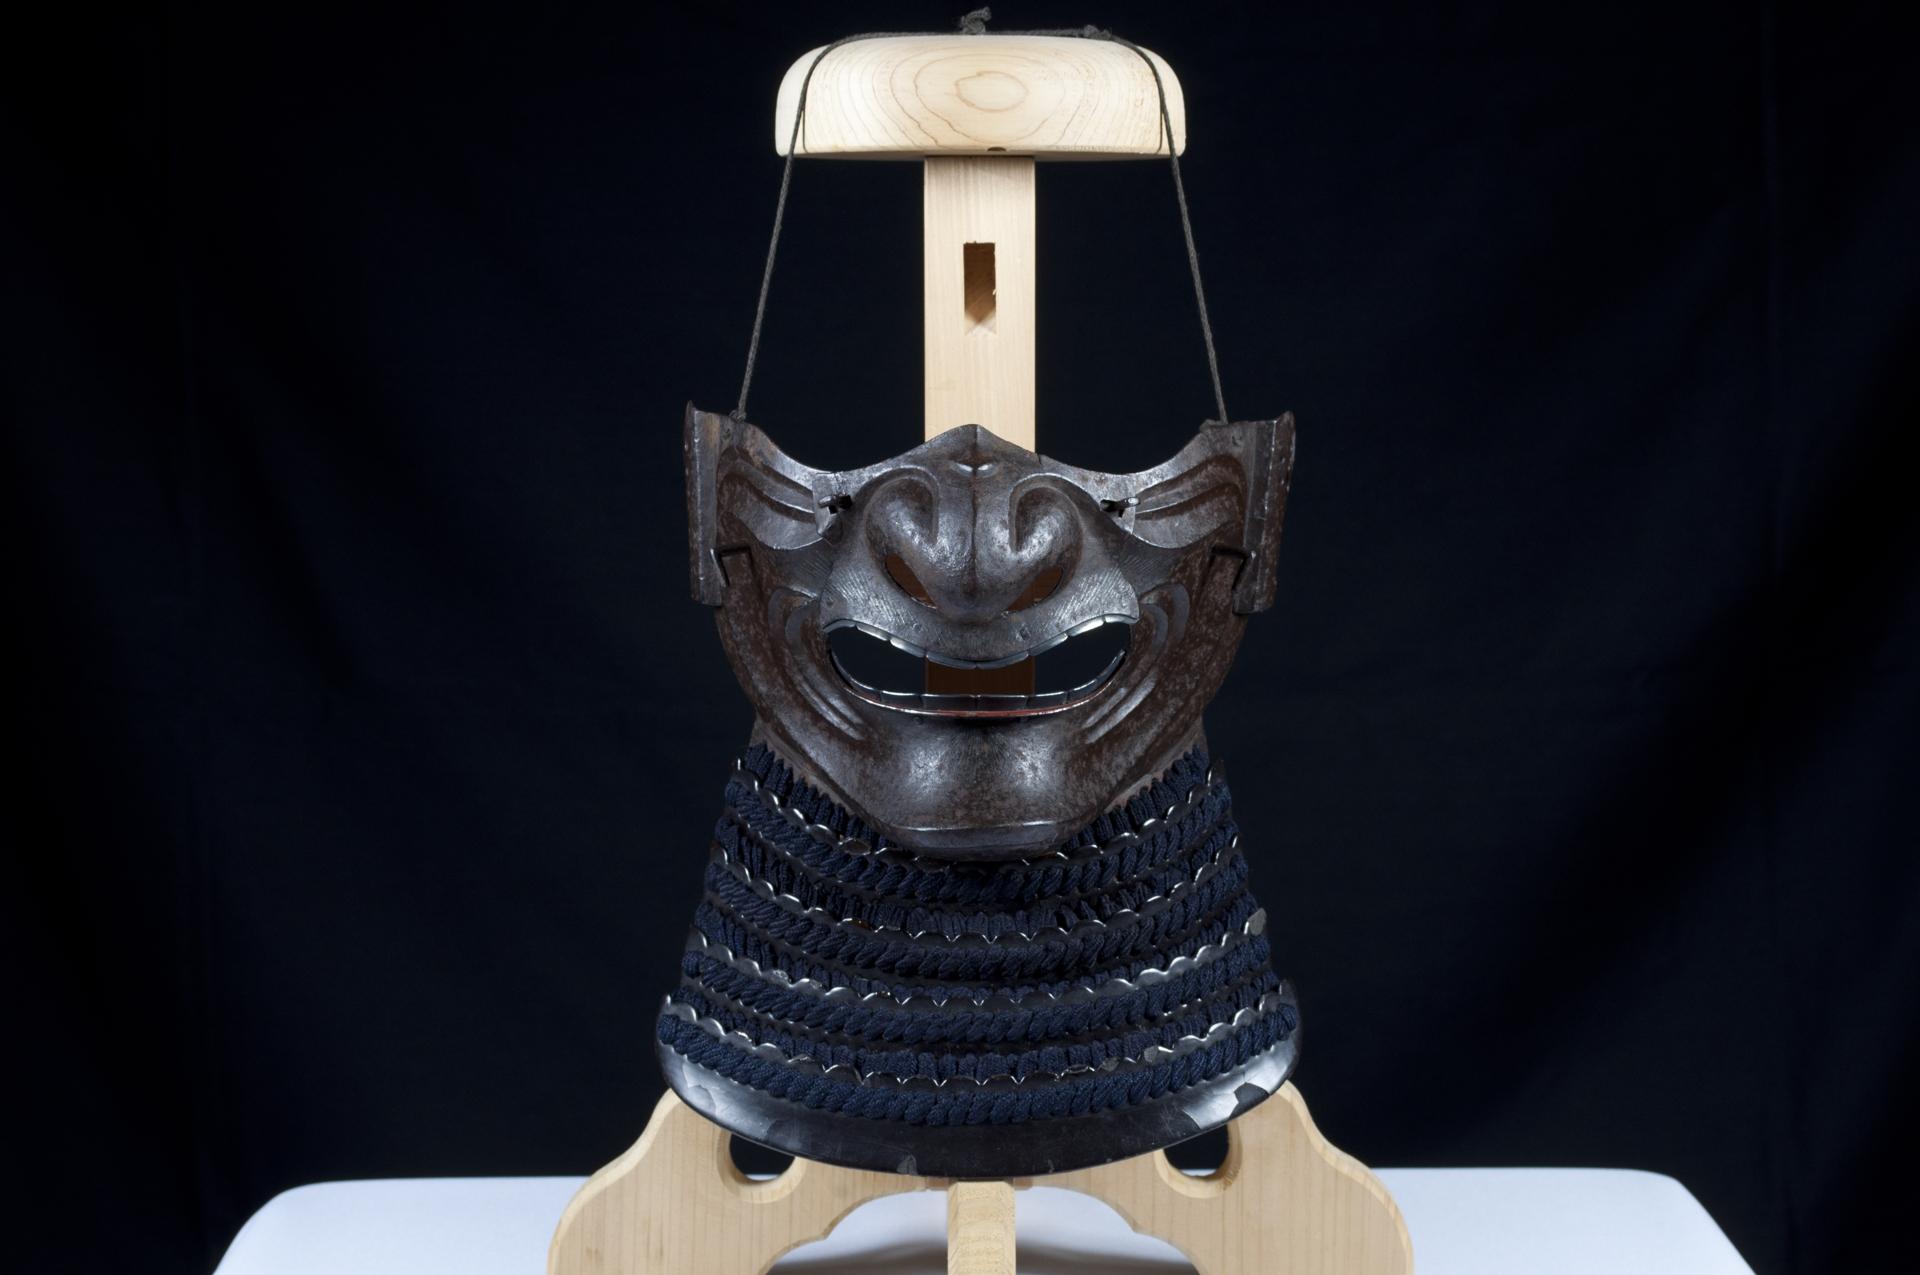 Menpo Reissei fer naturel Edo Armure Yoroi (2)